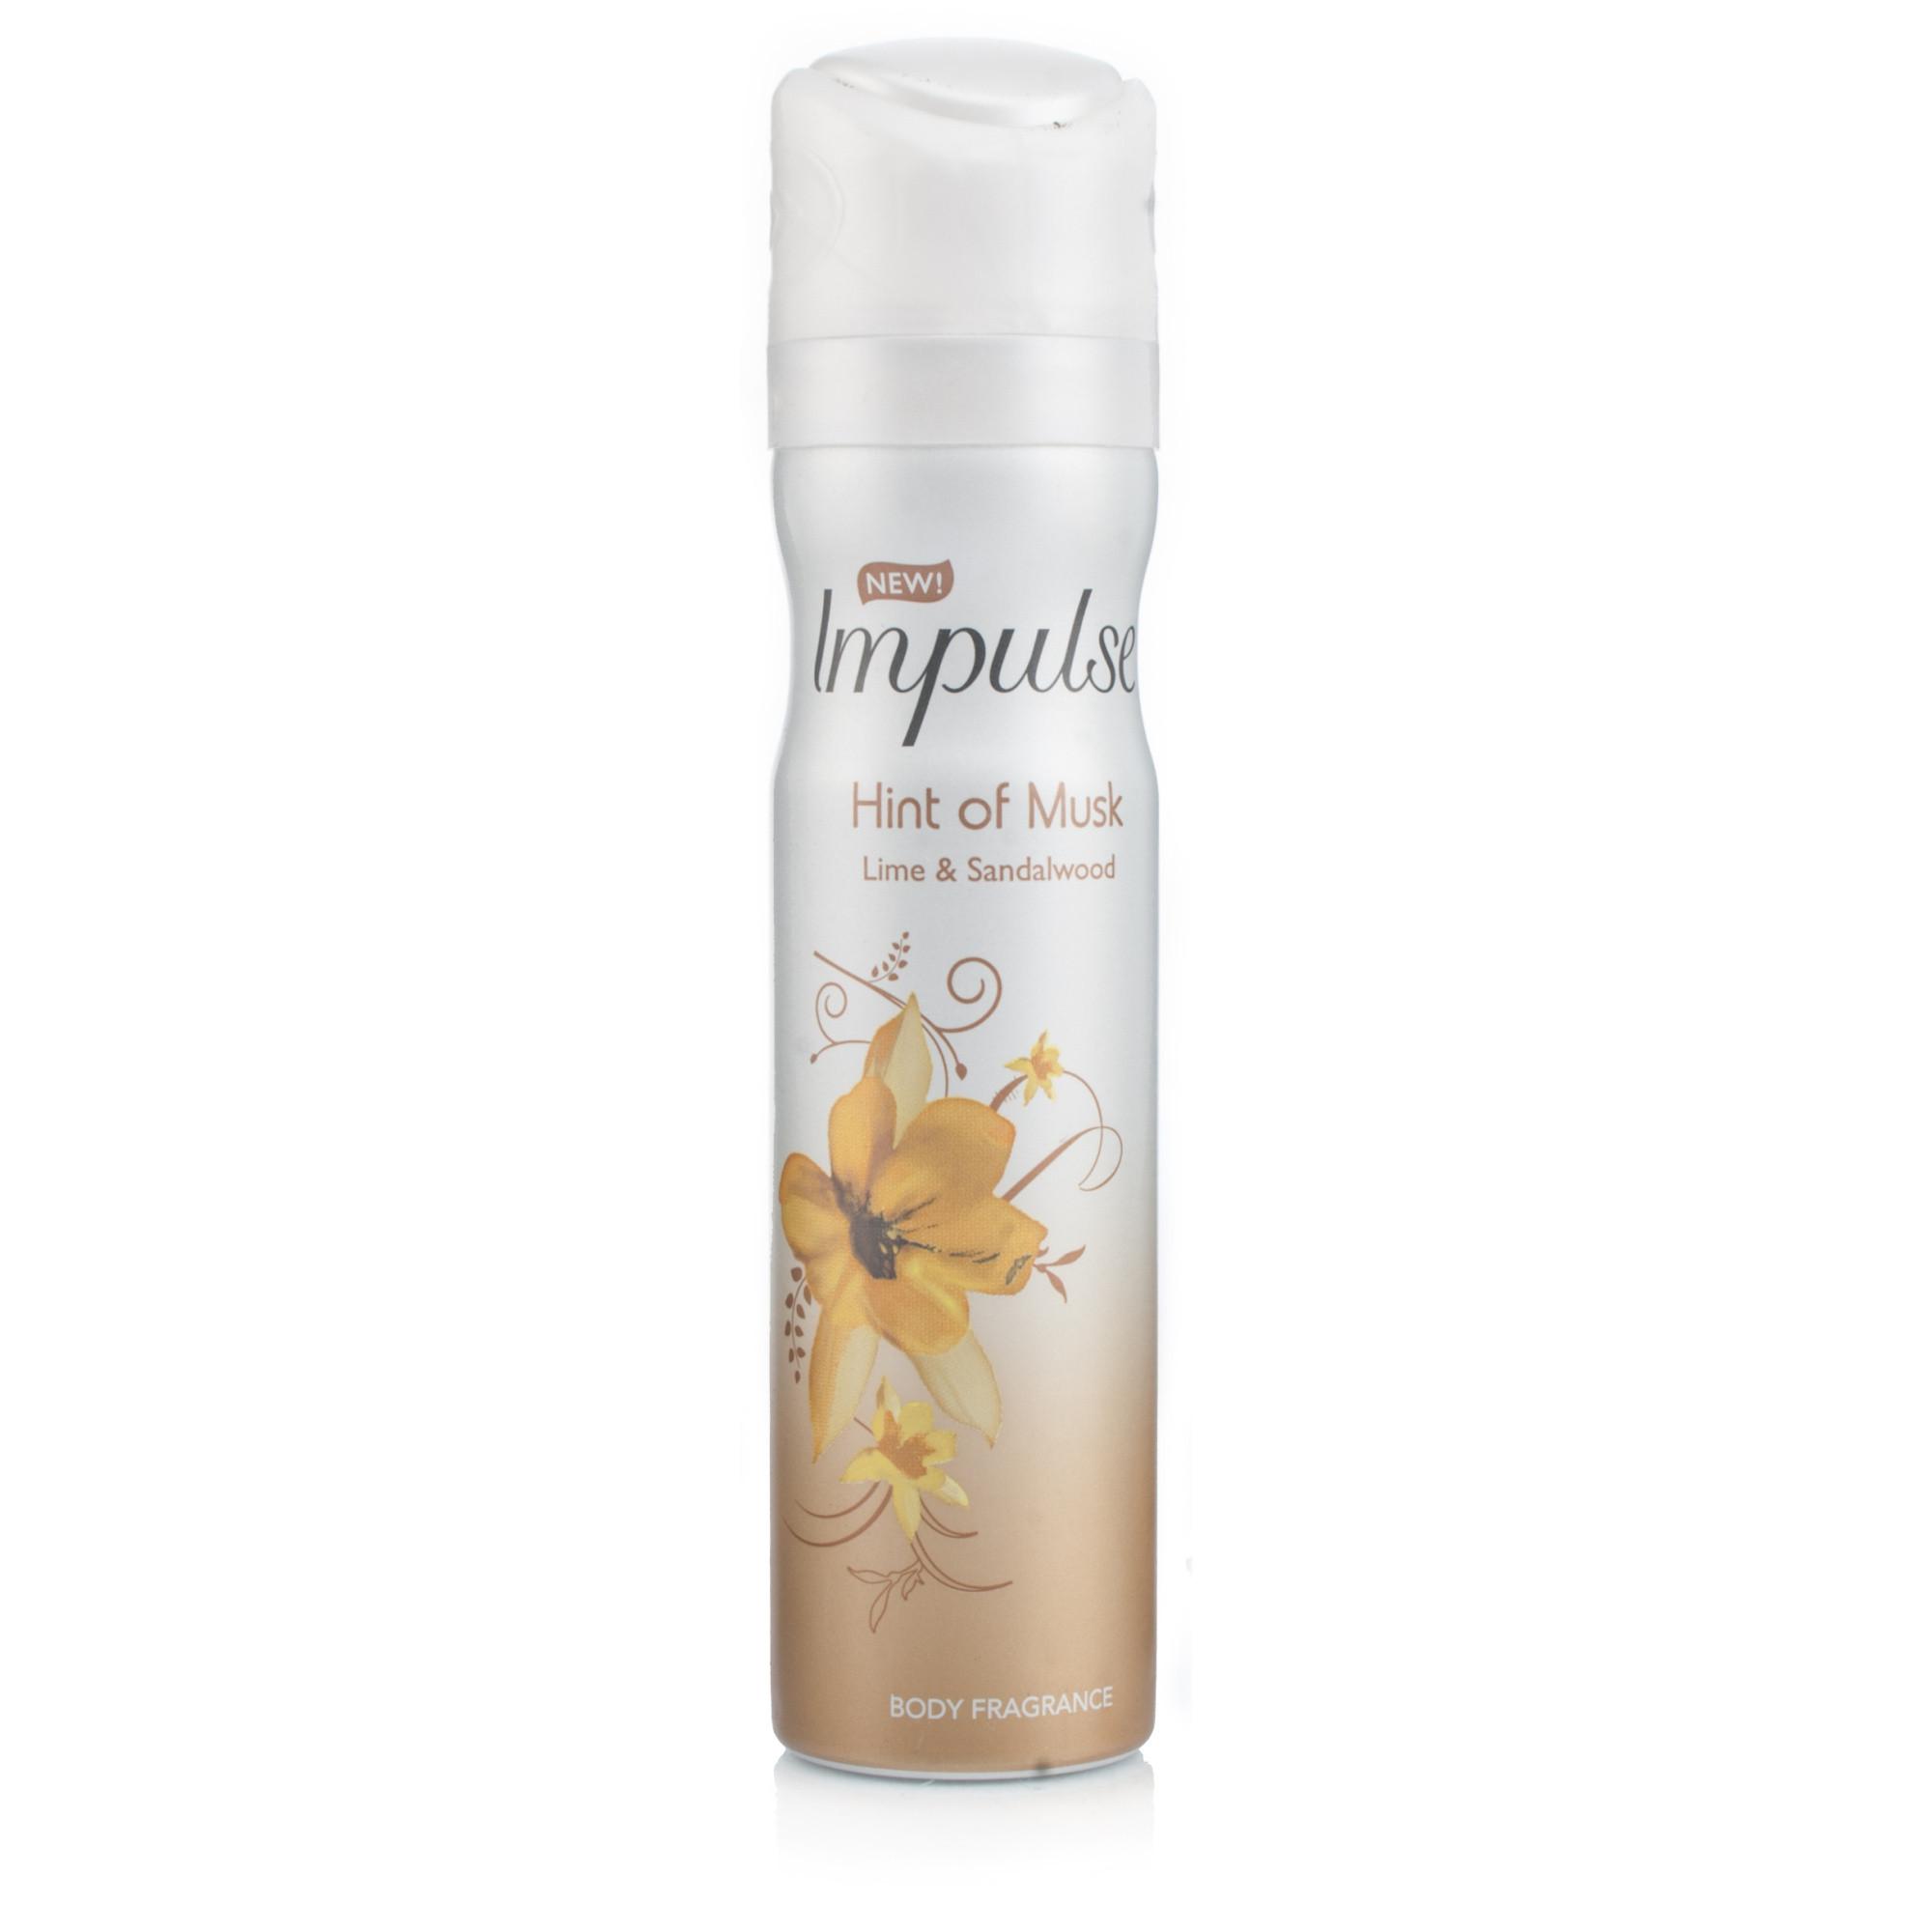 Impulse Body Spray - Hint Of Musk